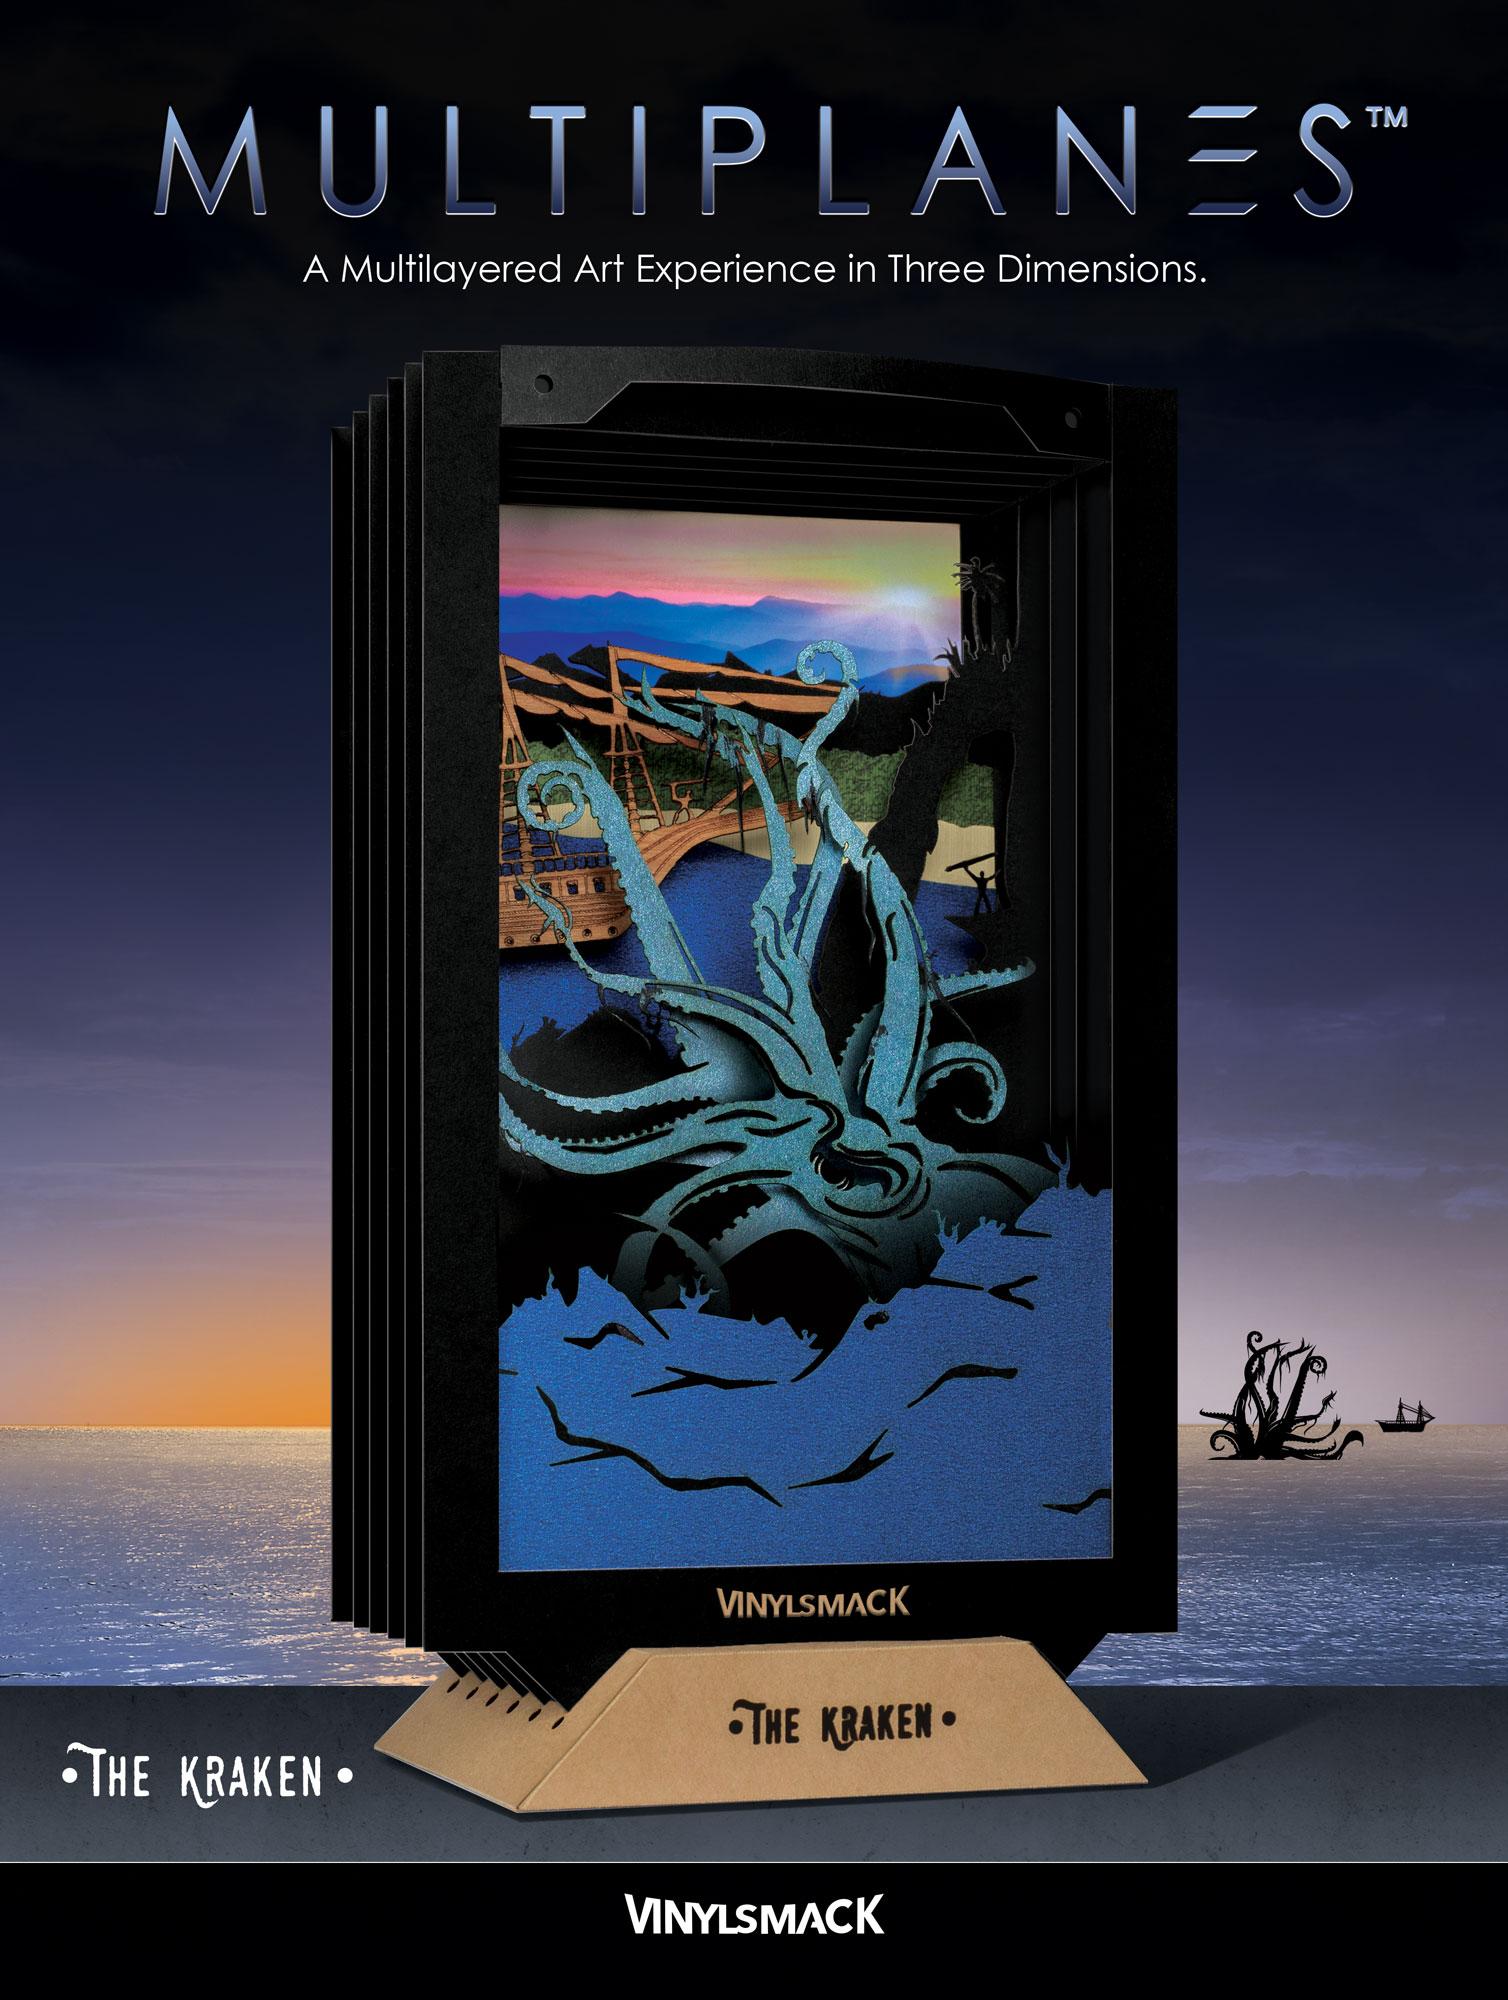 The Kraken - Package Front